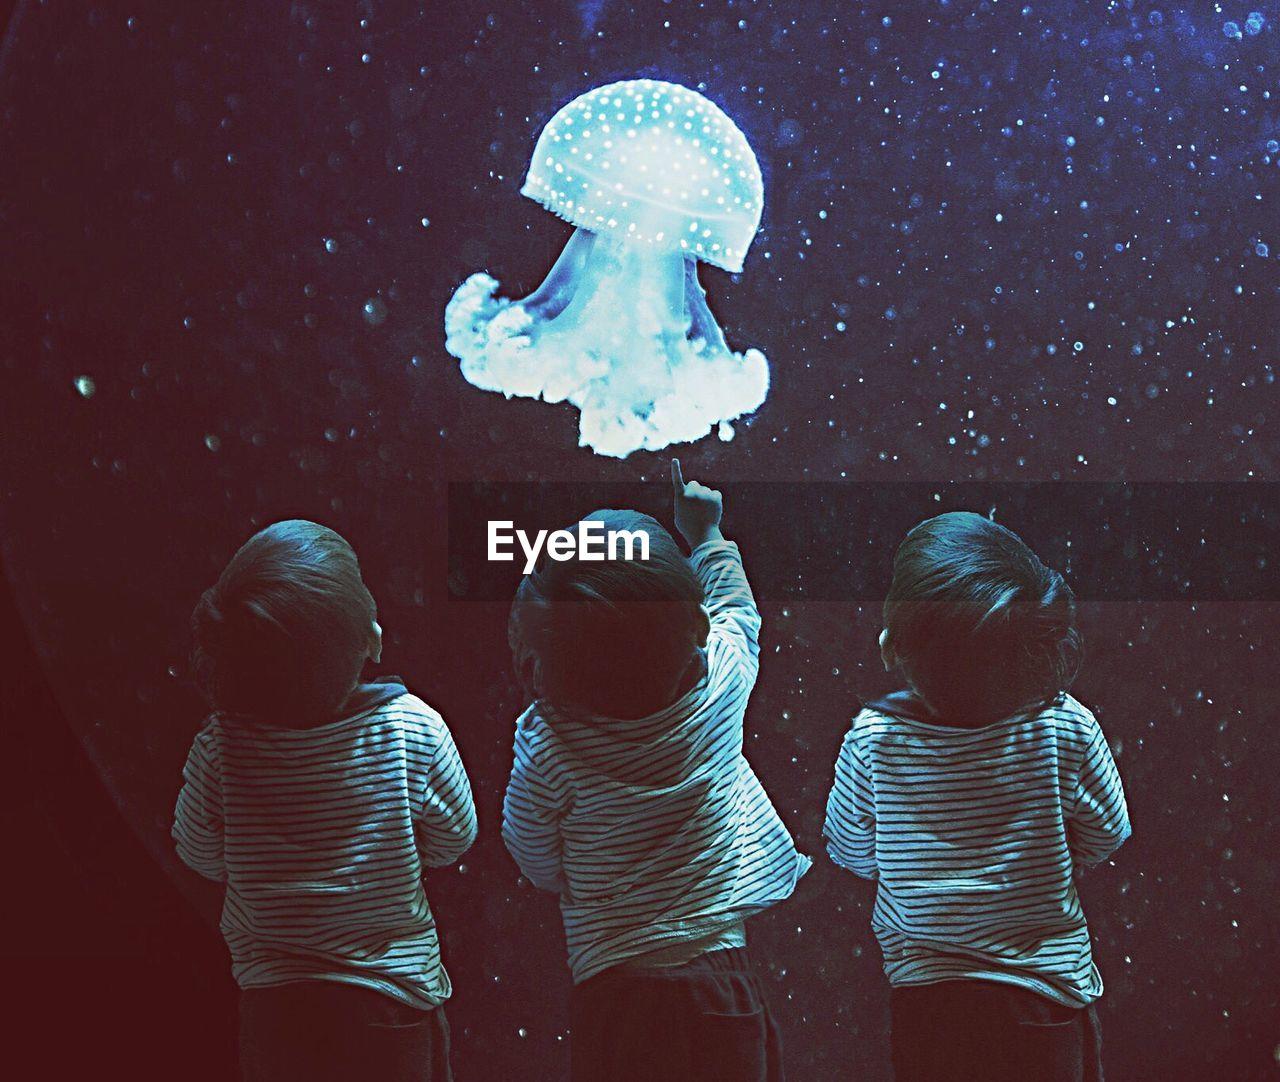 Multiple Image Of Boy Looking At Jellyfish In Aquarium